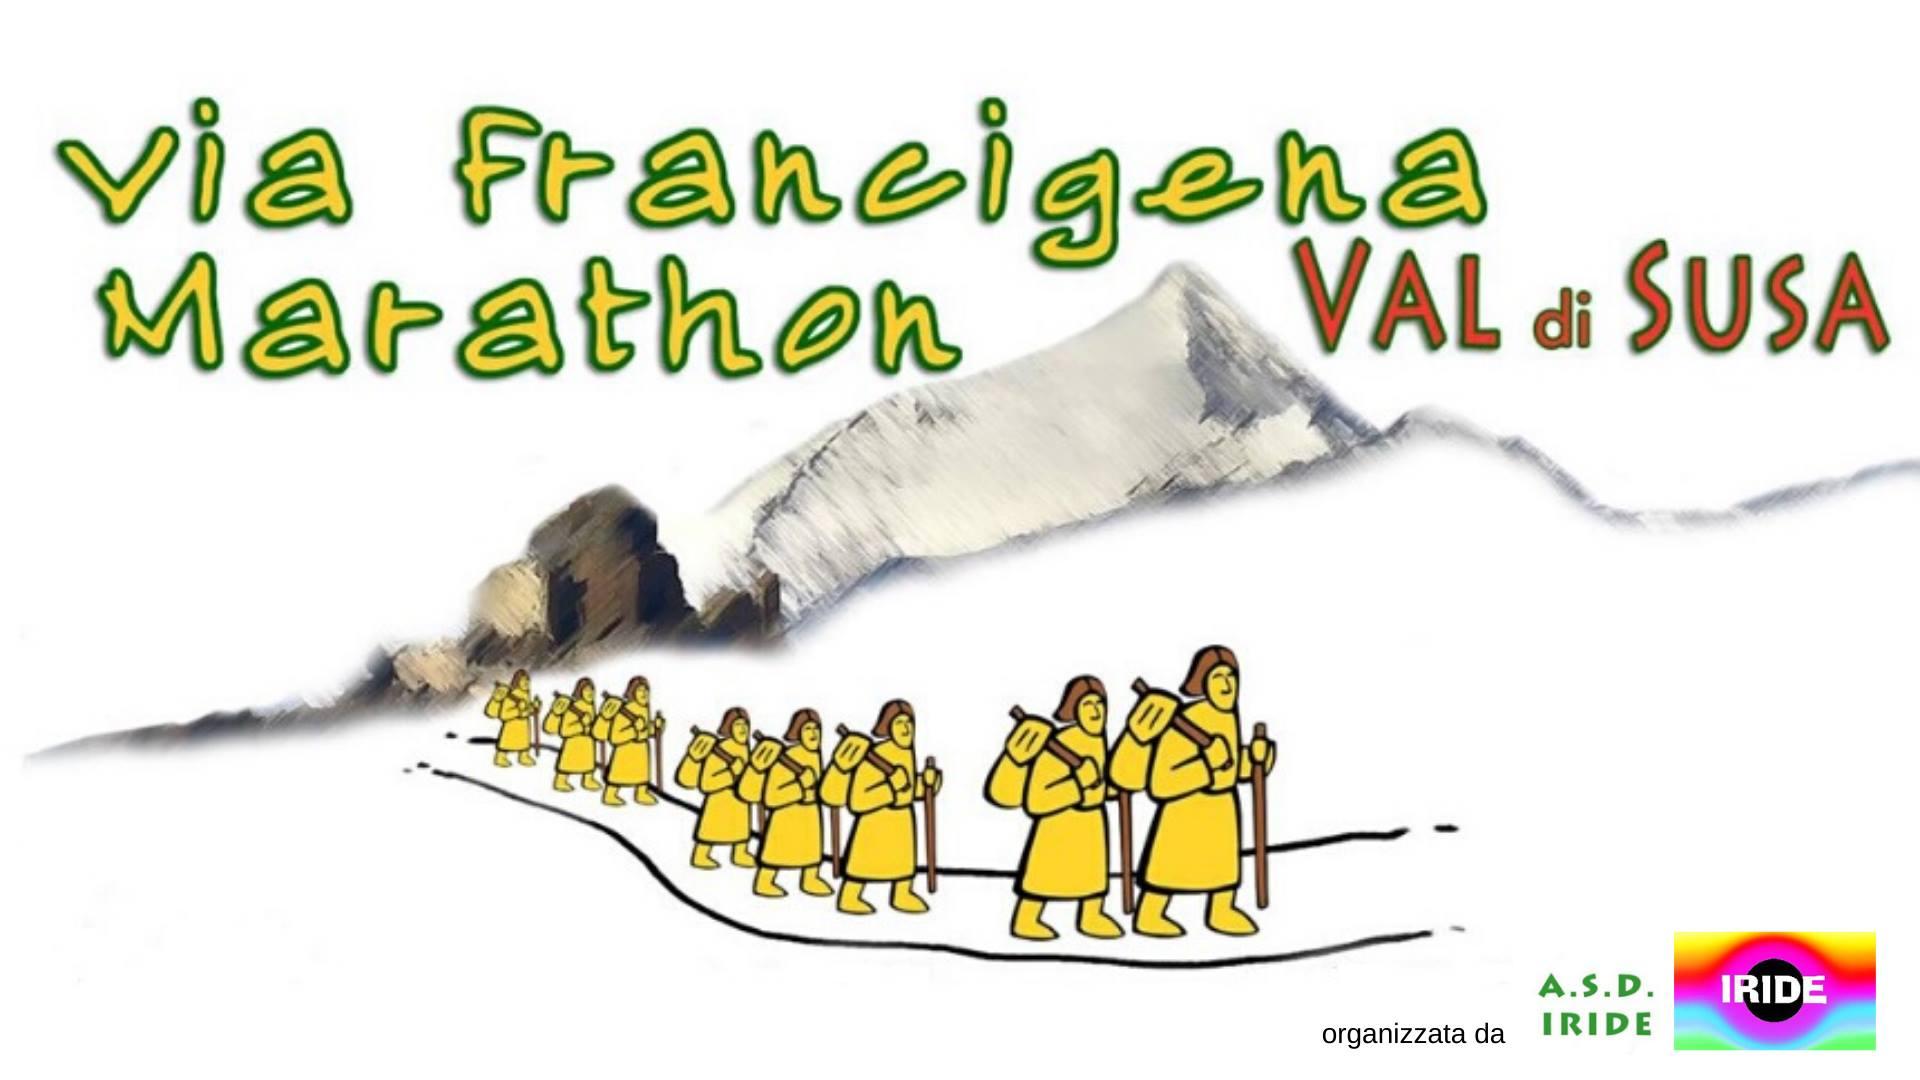 Via francigena marathon val di susa spostata al 20 giugno 2021